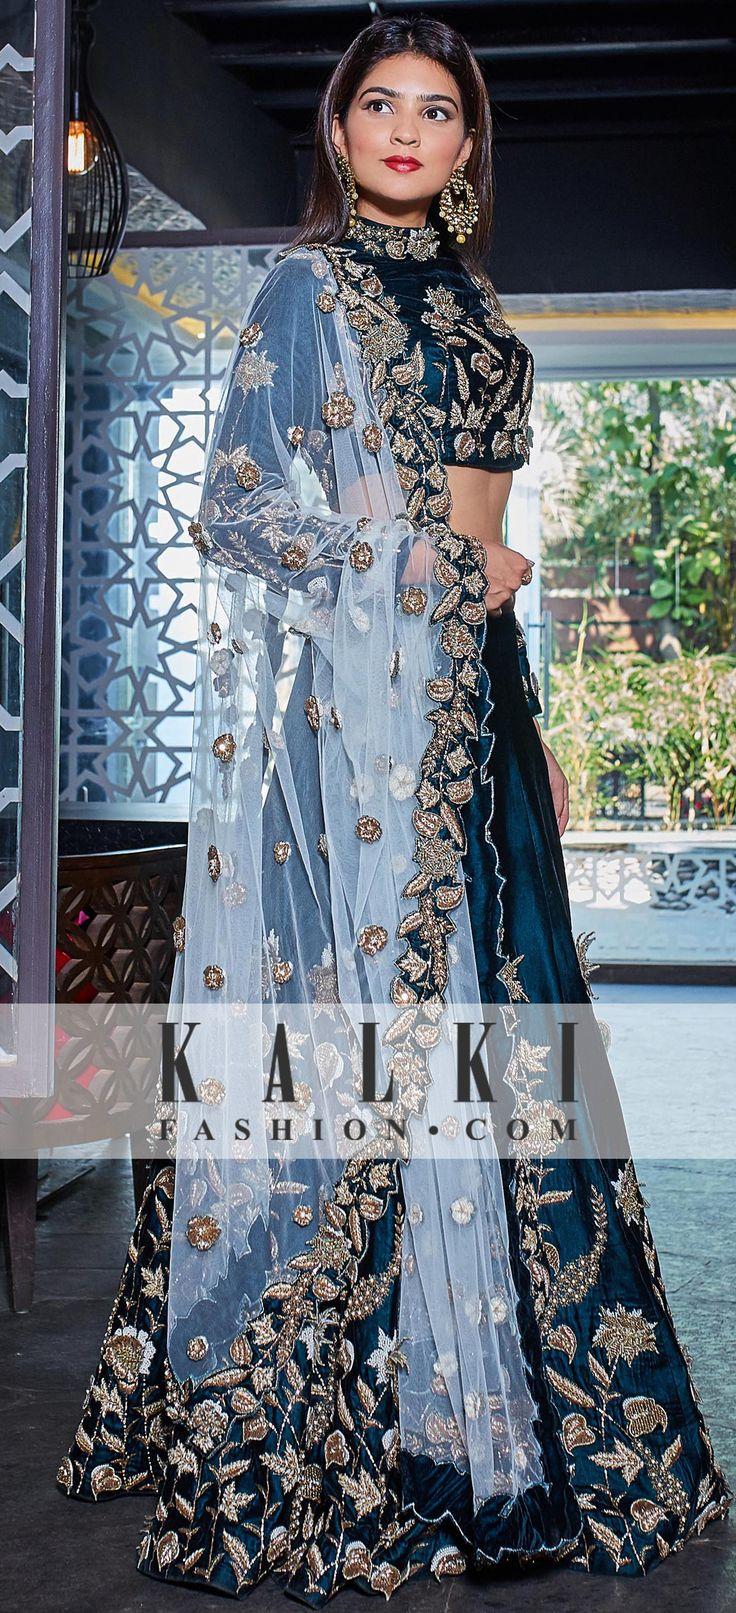 Madhura - Fashion Blogger